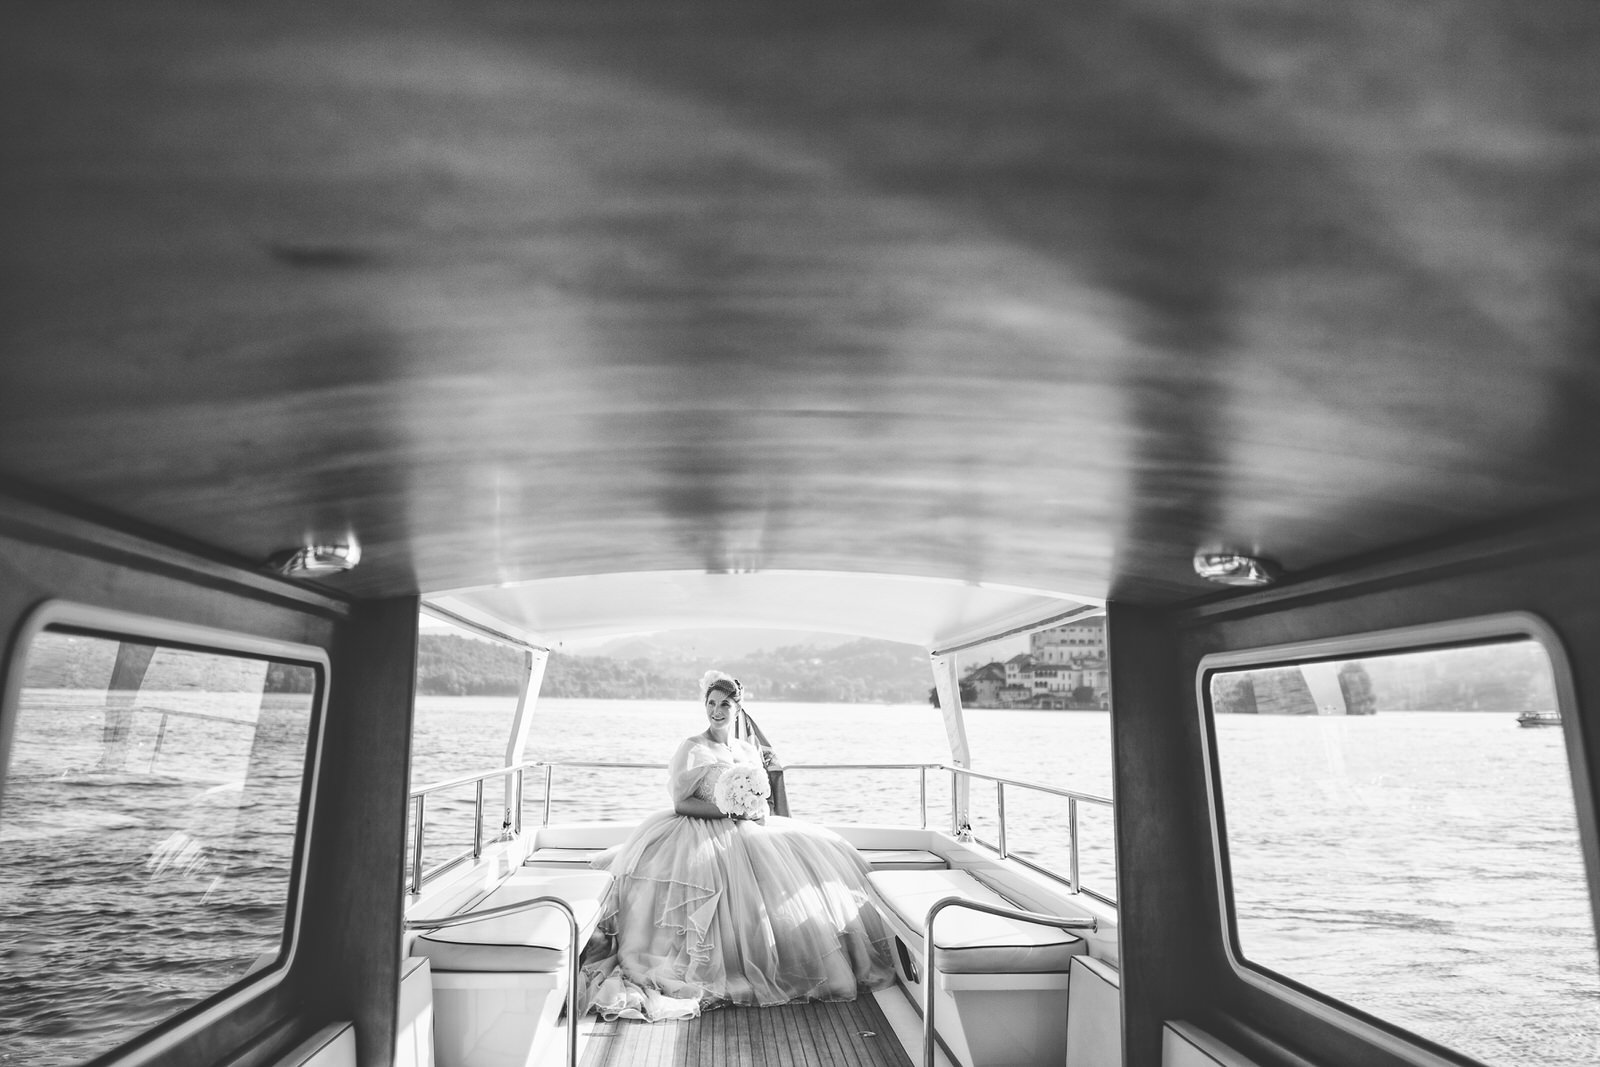 wedding photographer in italy-venice-tuscany-florence-amalfi coast-como lake-villa del balbianello-siena-amalfi-ravello-belmond-villa cimbrone29